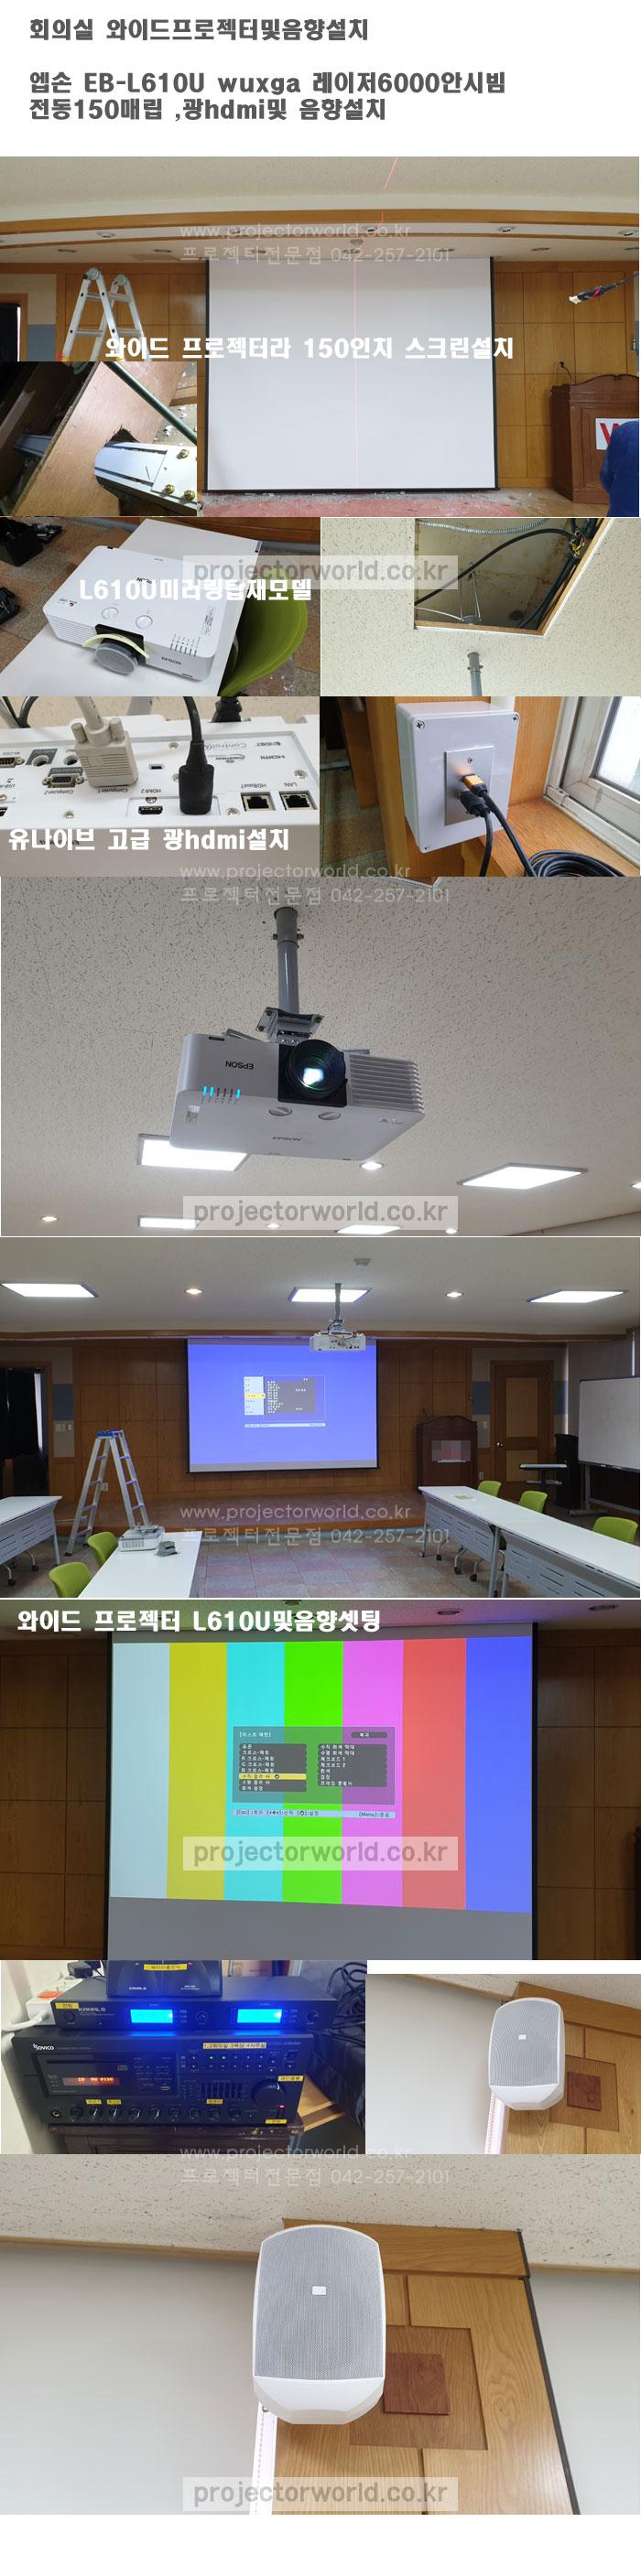 EB-L610U,6000안시,레이저프로젝터,대전프로젝터,150인치전동매립형,unive광hdmi,논산스크린빔설치,